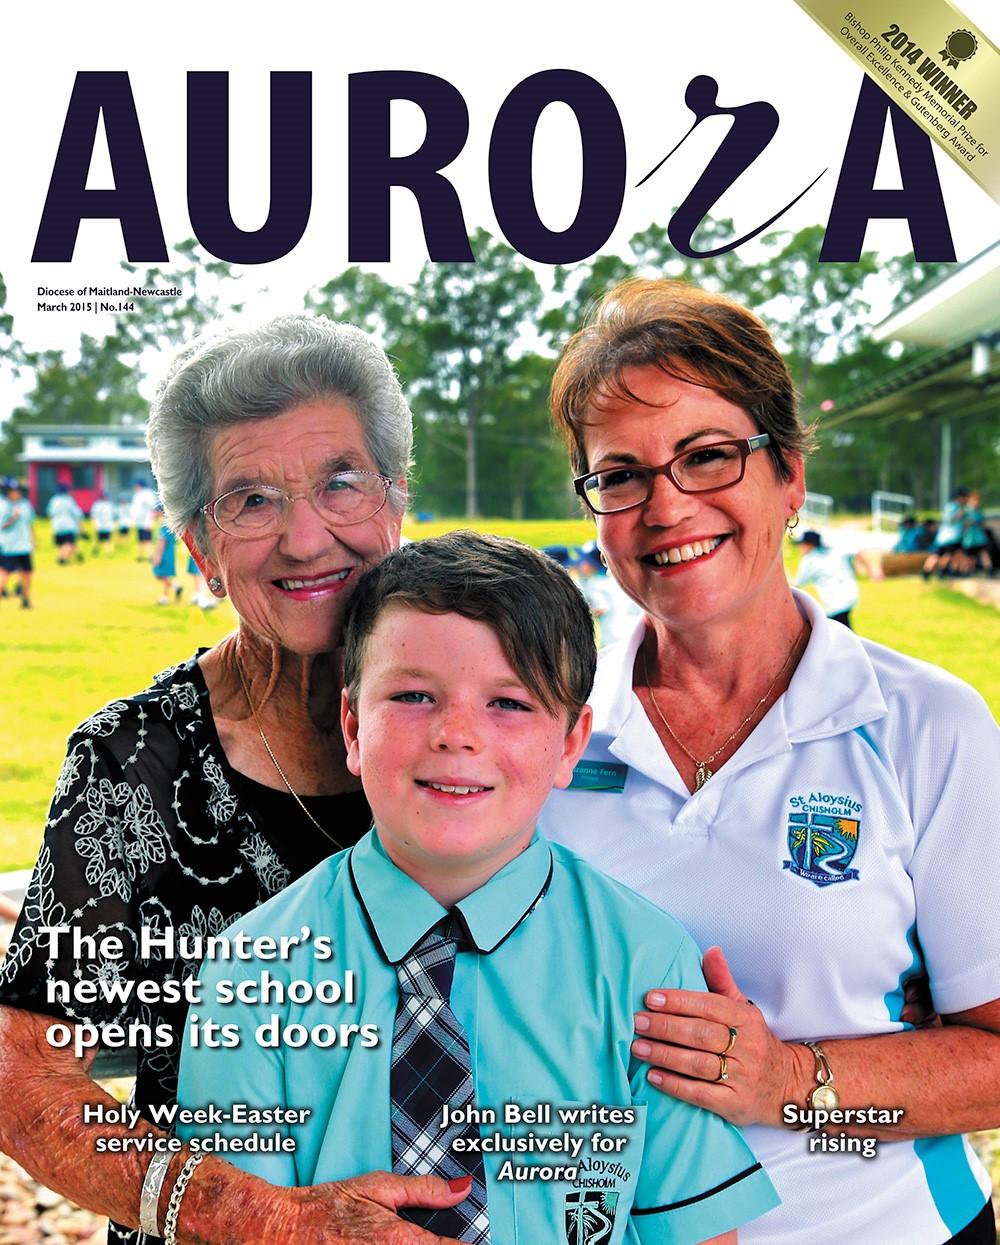 Aurora March 2015 Cover Image